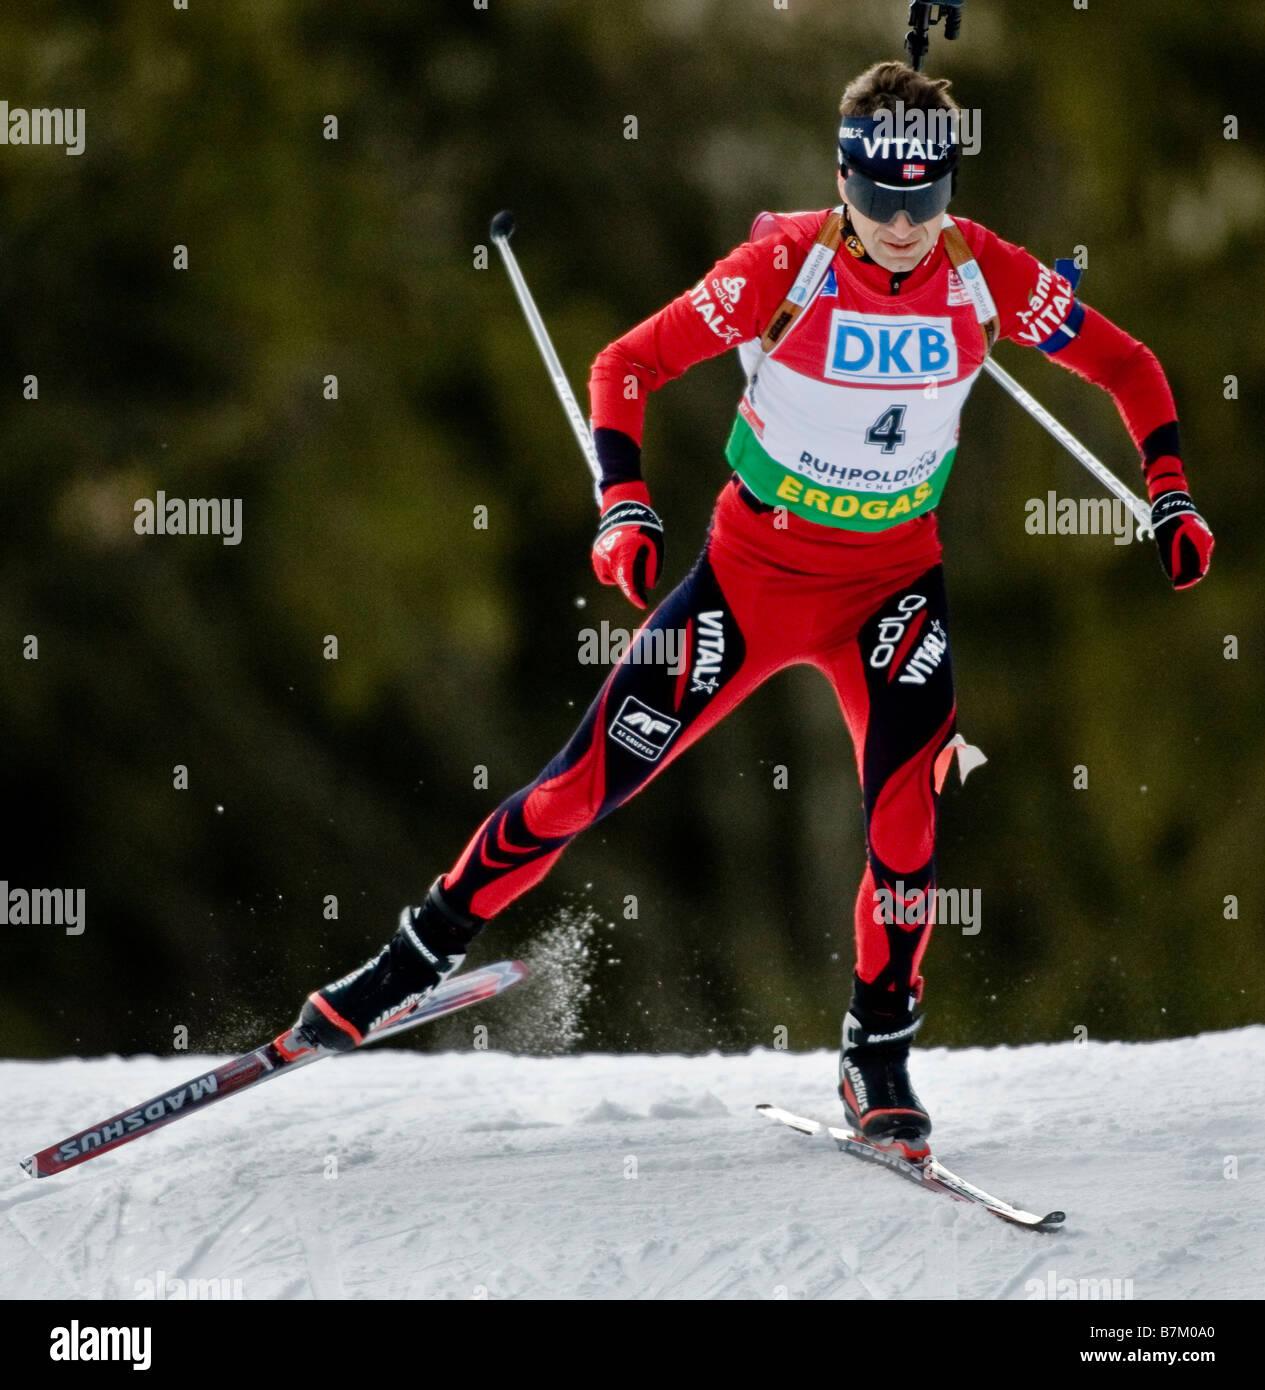 BJOERNDALEN Ole Einar Norwegen Biathlon Weltcup Sprint Männer Ruhpolding 17 1 2009 - Stock Image